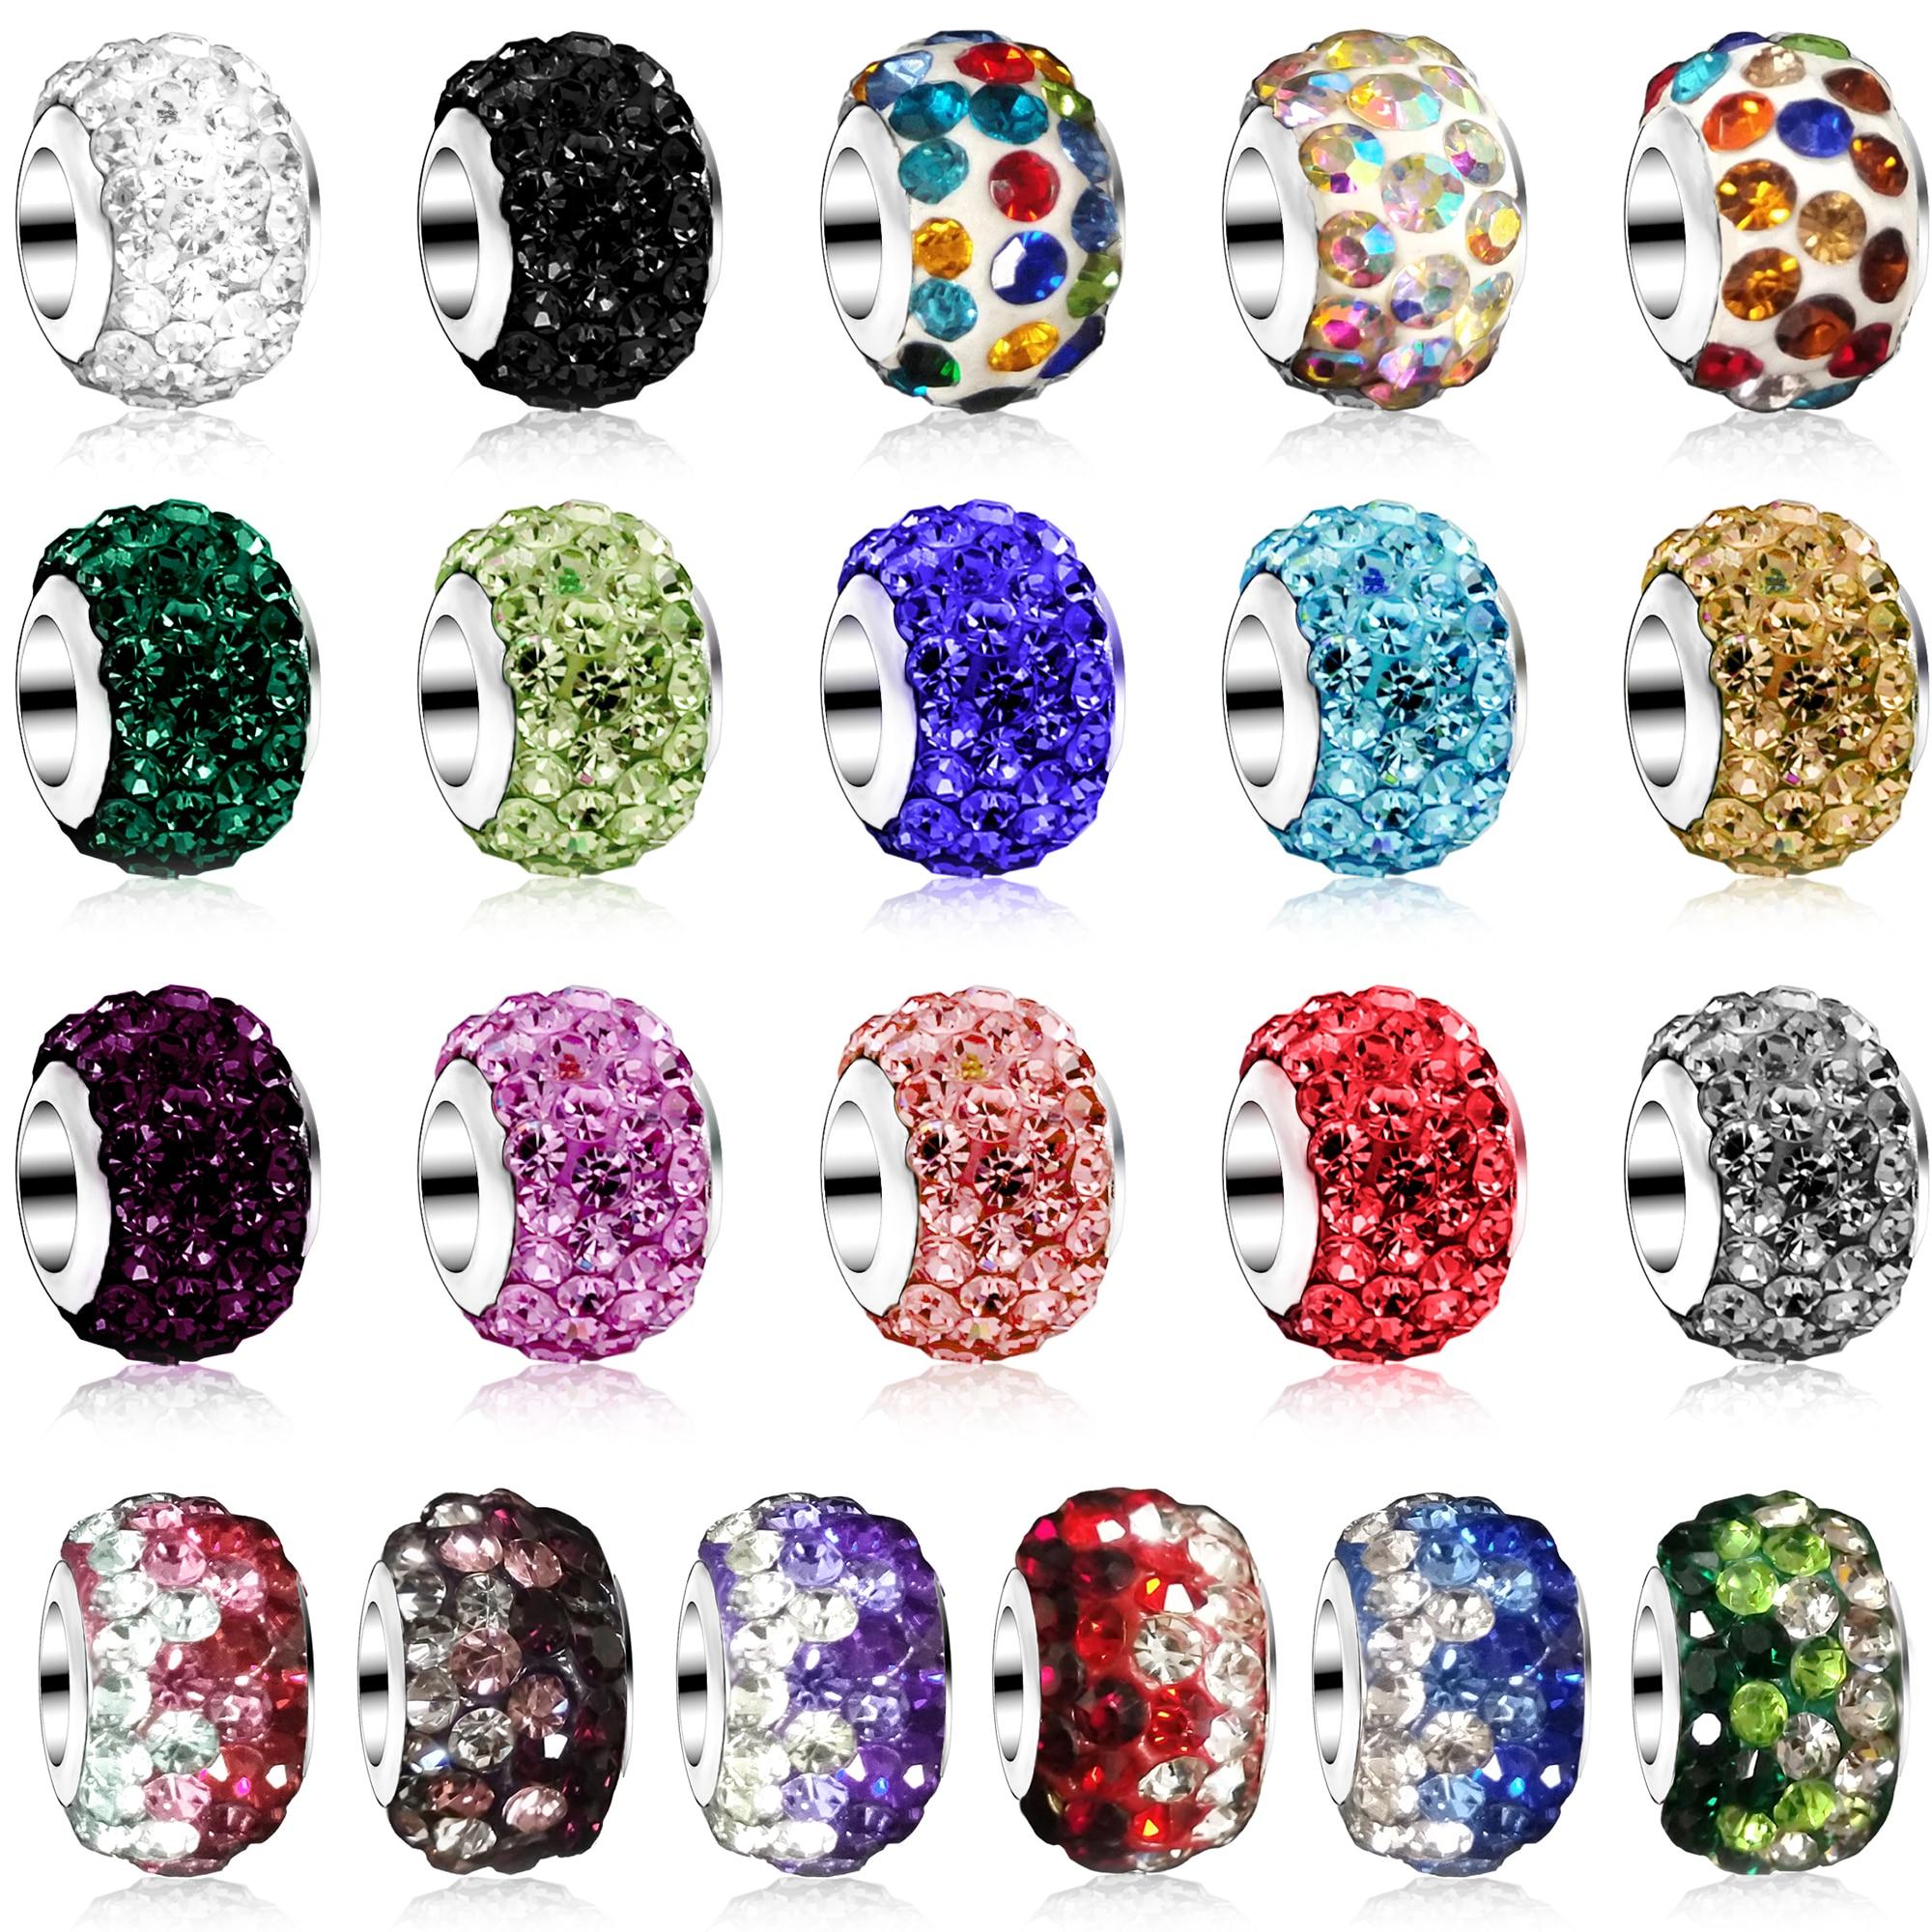 DINGLLY 2Pcs Multi-color brilliant little Crystal Beaded Fit Brands Charm Bracelet For Women Men DIY Bangle Original Jewelry(China)